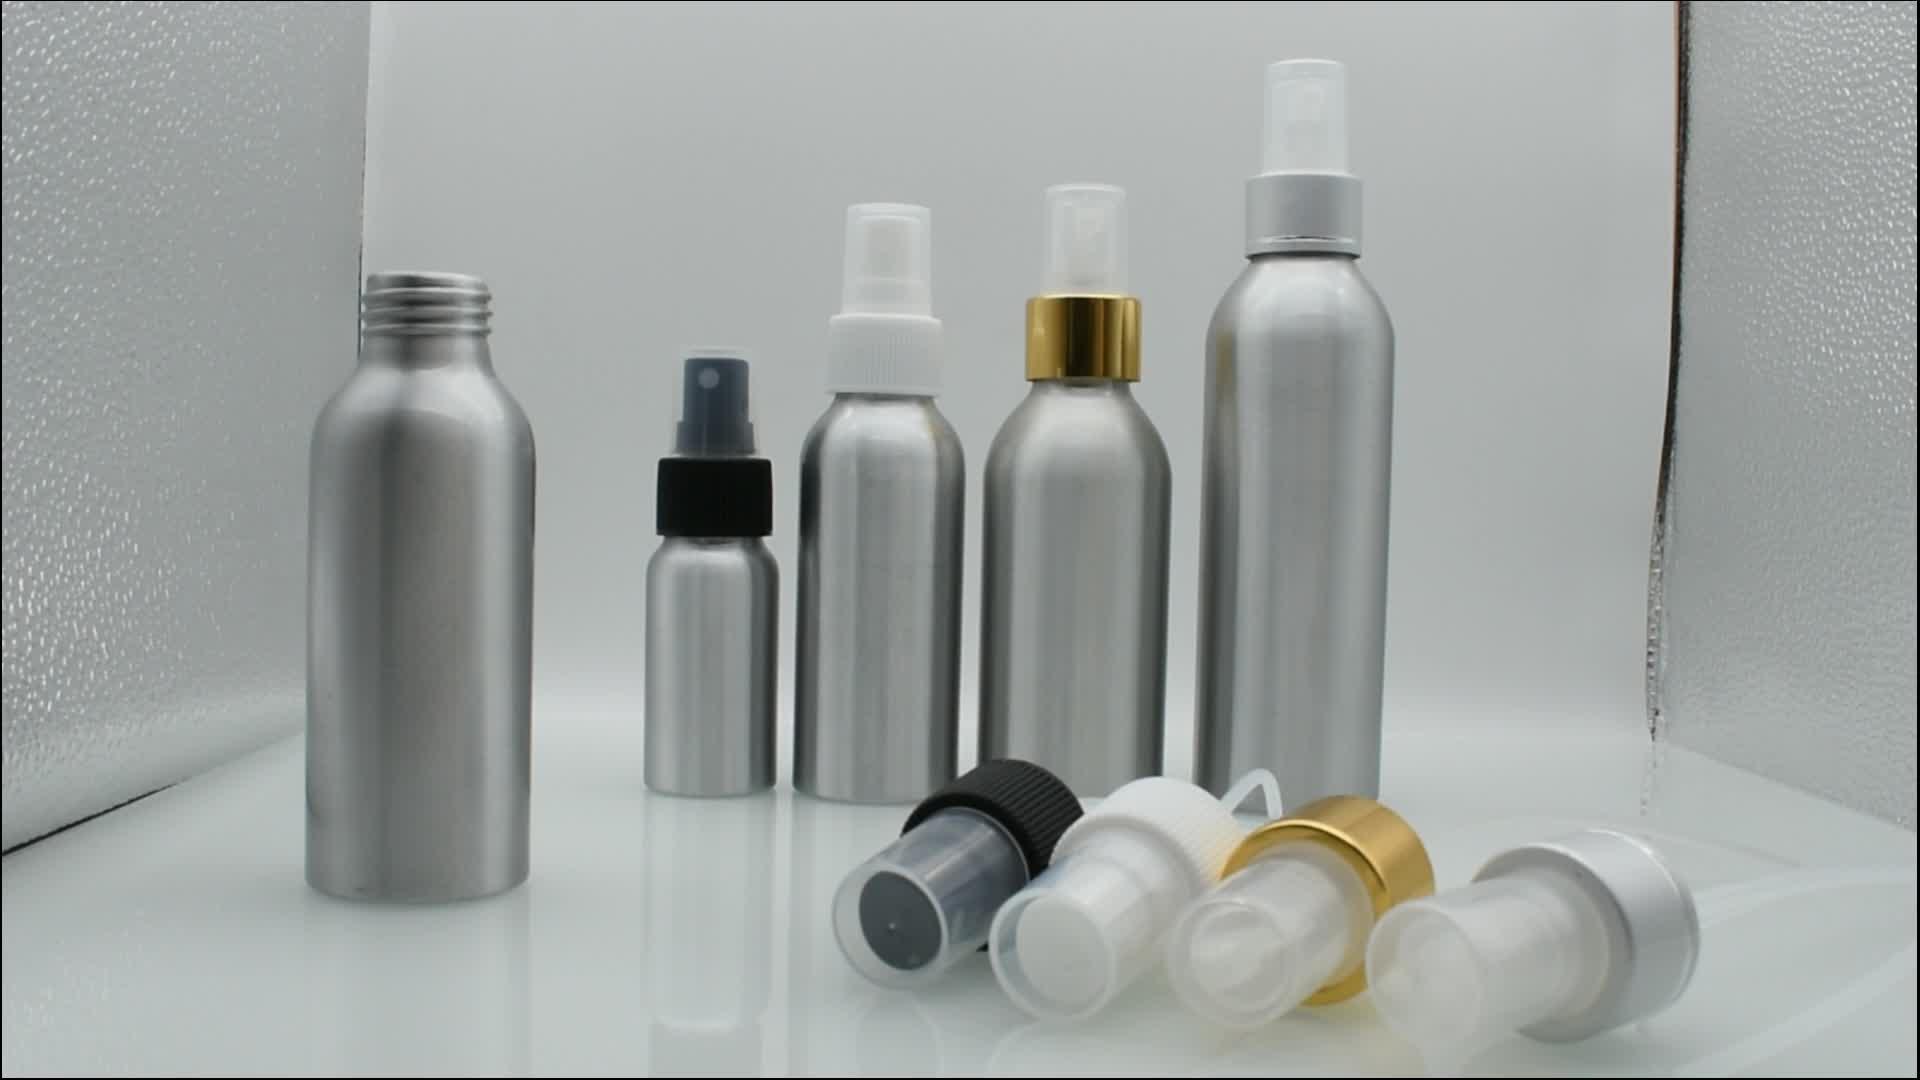 10 ml 15 ml 30 ml 50 ml 60 ml 120 ml 150 ml minyak esensial aluminium semprot botol dengan topi plastik semprot untuk minyak esensial e cair